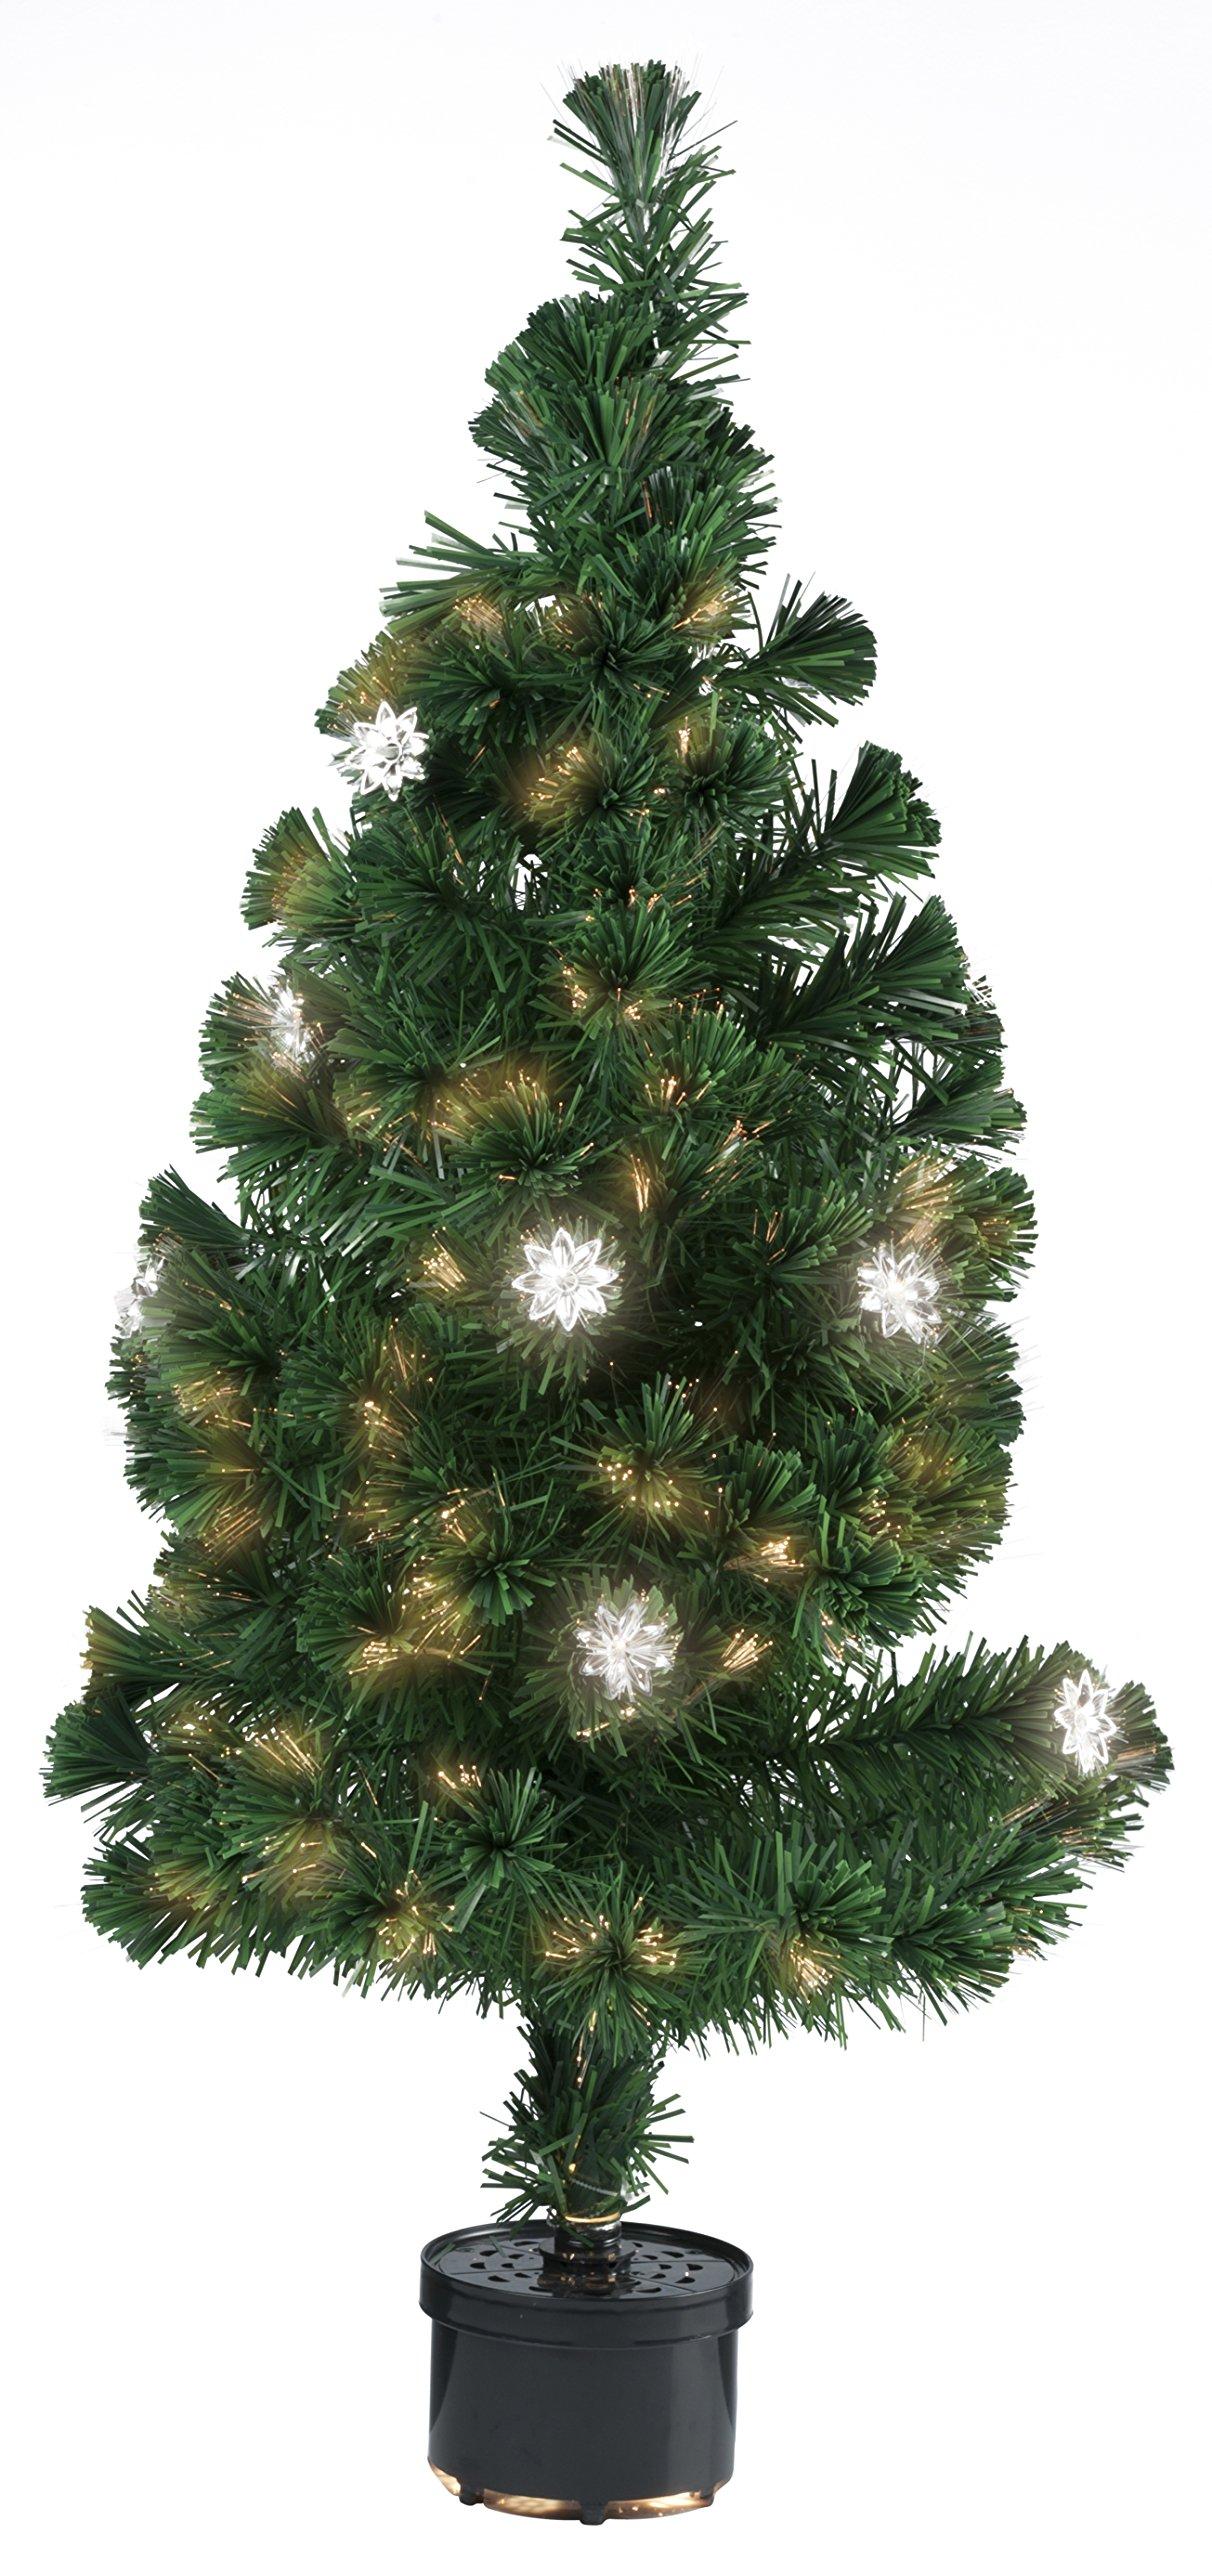 Christmas-Gifts-Weihnachtsbaum-Kunststoff-grn